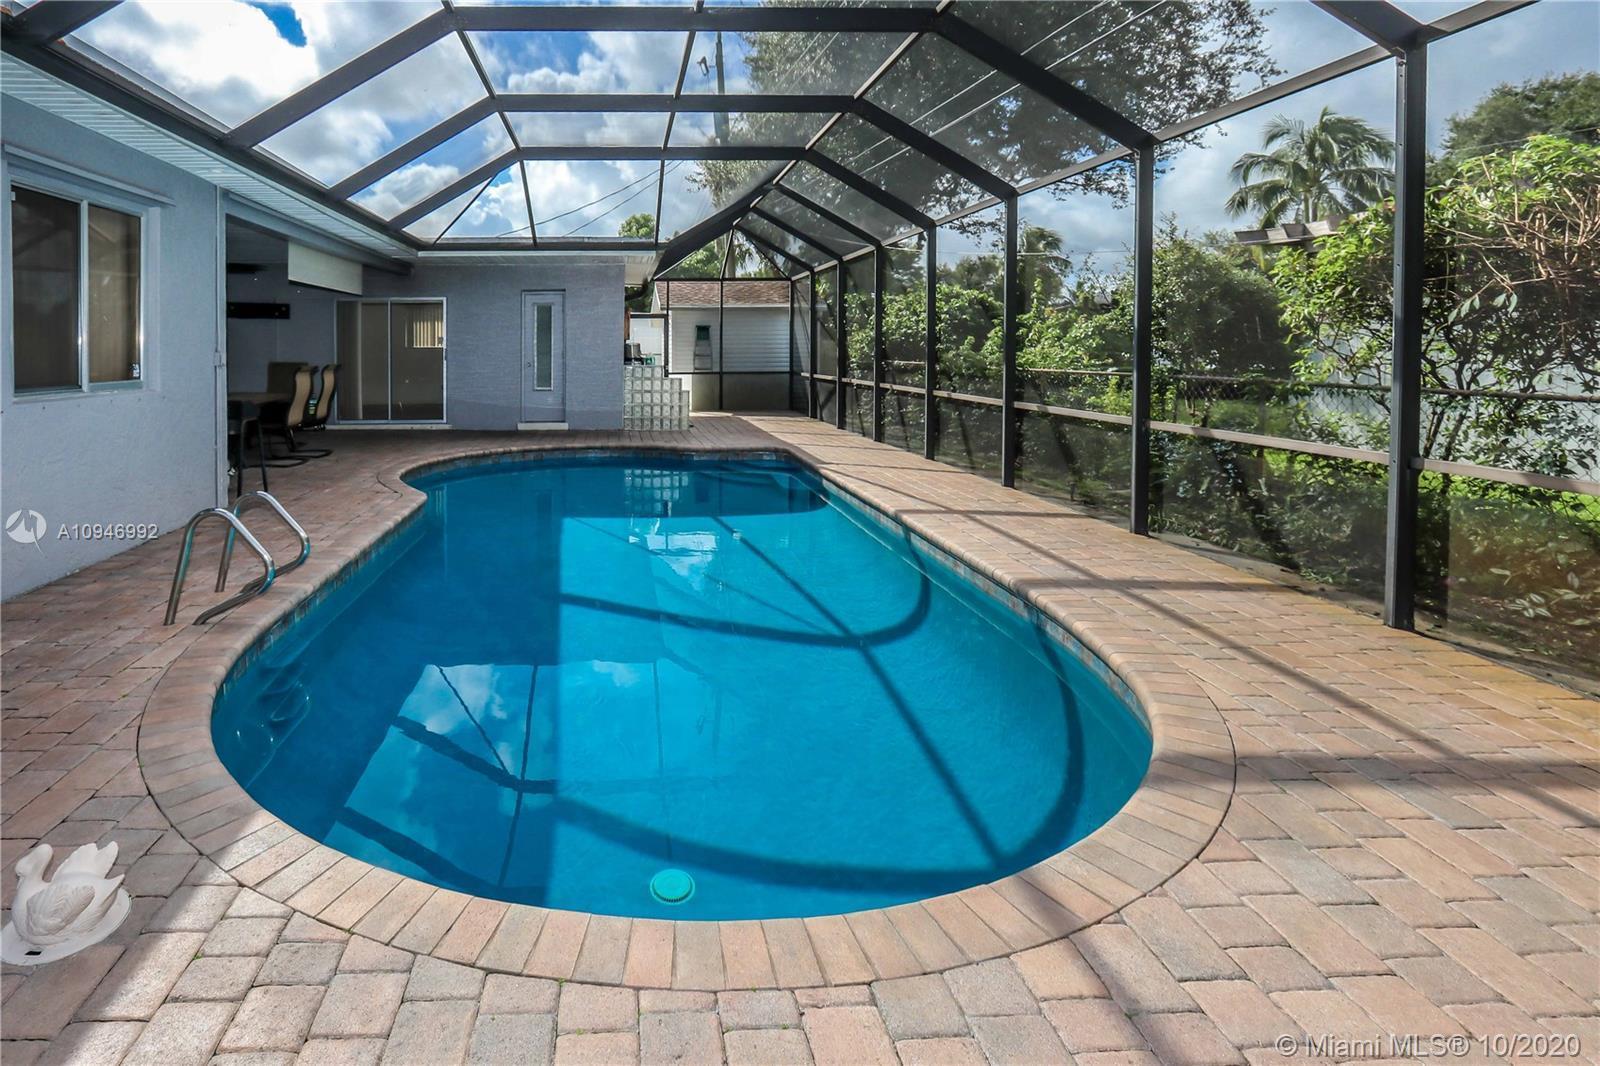 Beautiful 3 BR, 2 BA, 1 car garage, salt water Pool. Home features spacious kitchen w/granite counte